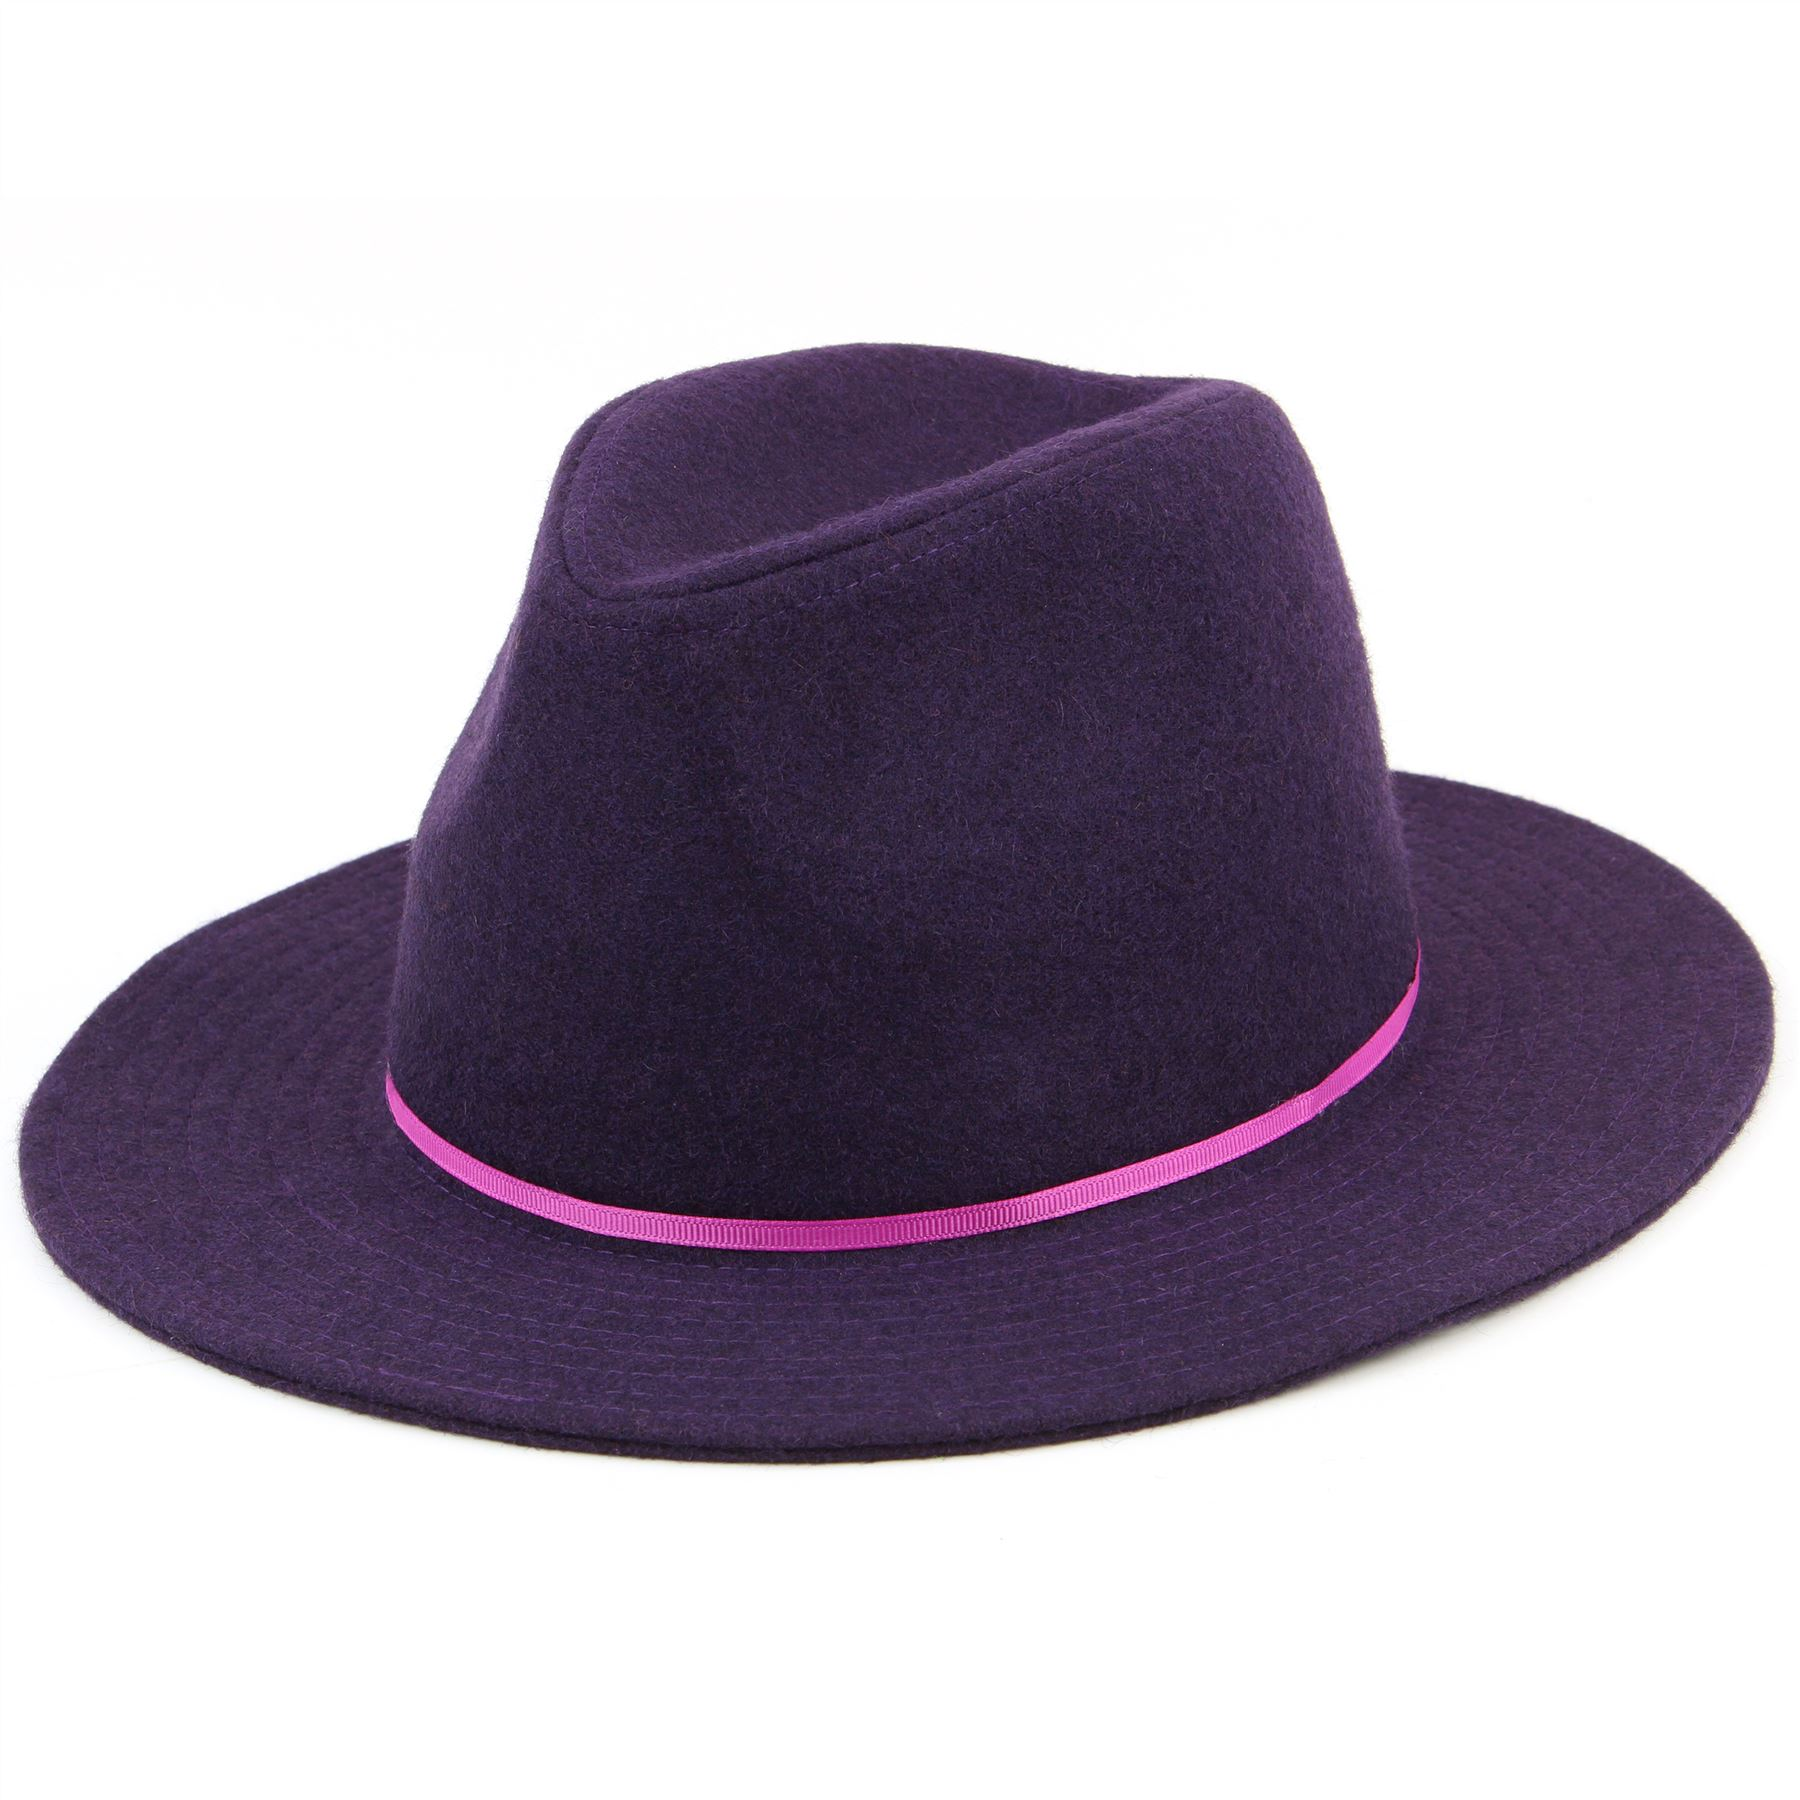 8f63157e Wool Fedora Hat Hawkins Womens Ladies Brim Black Purple Brown Cap | eBay